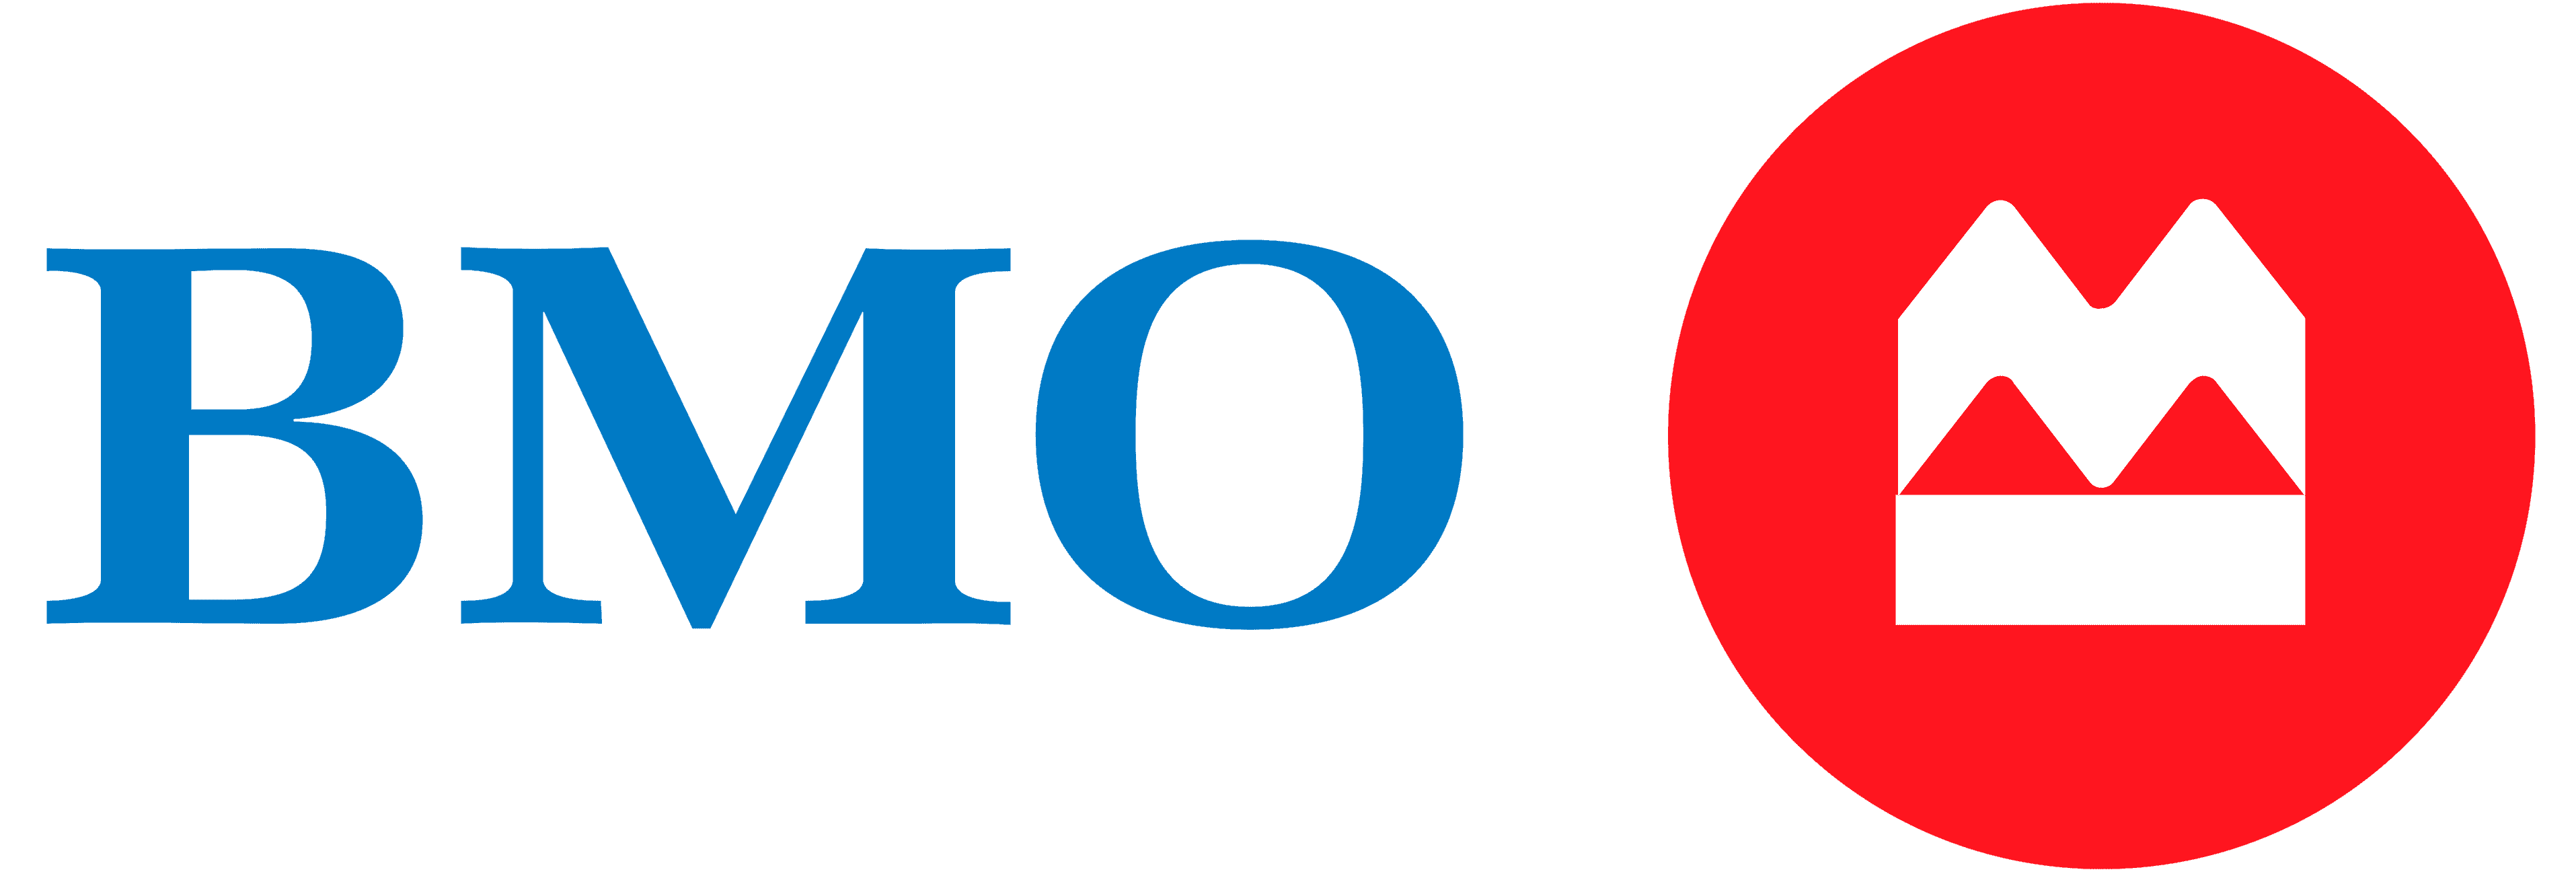 The logo of BMO